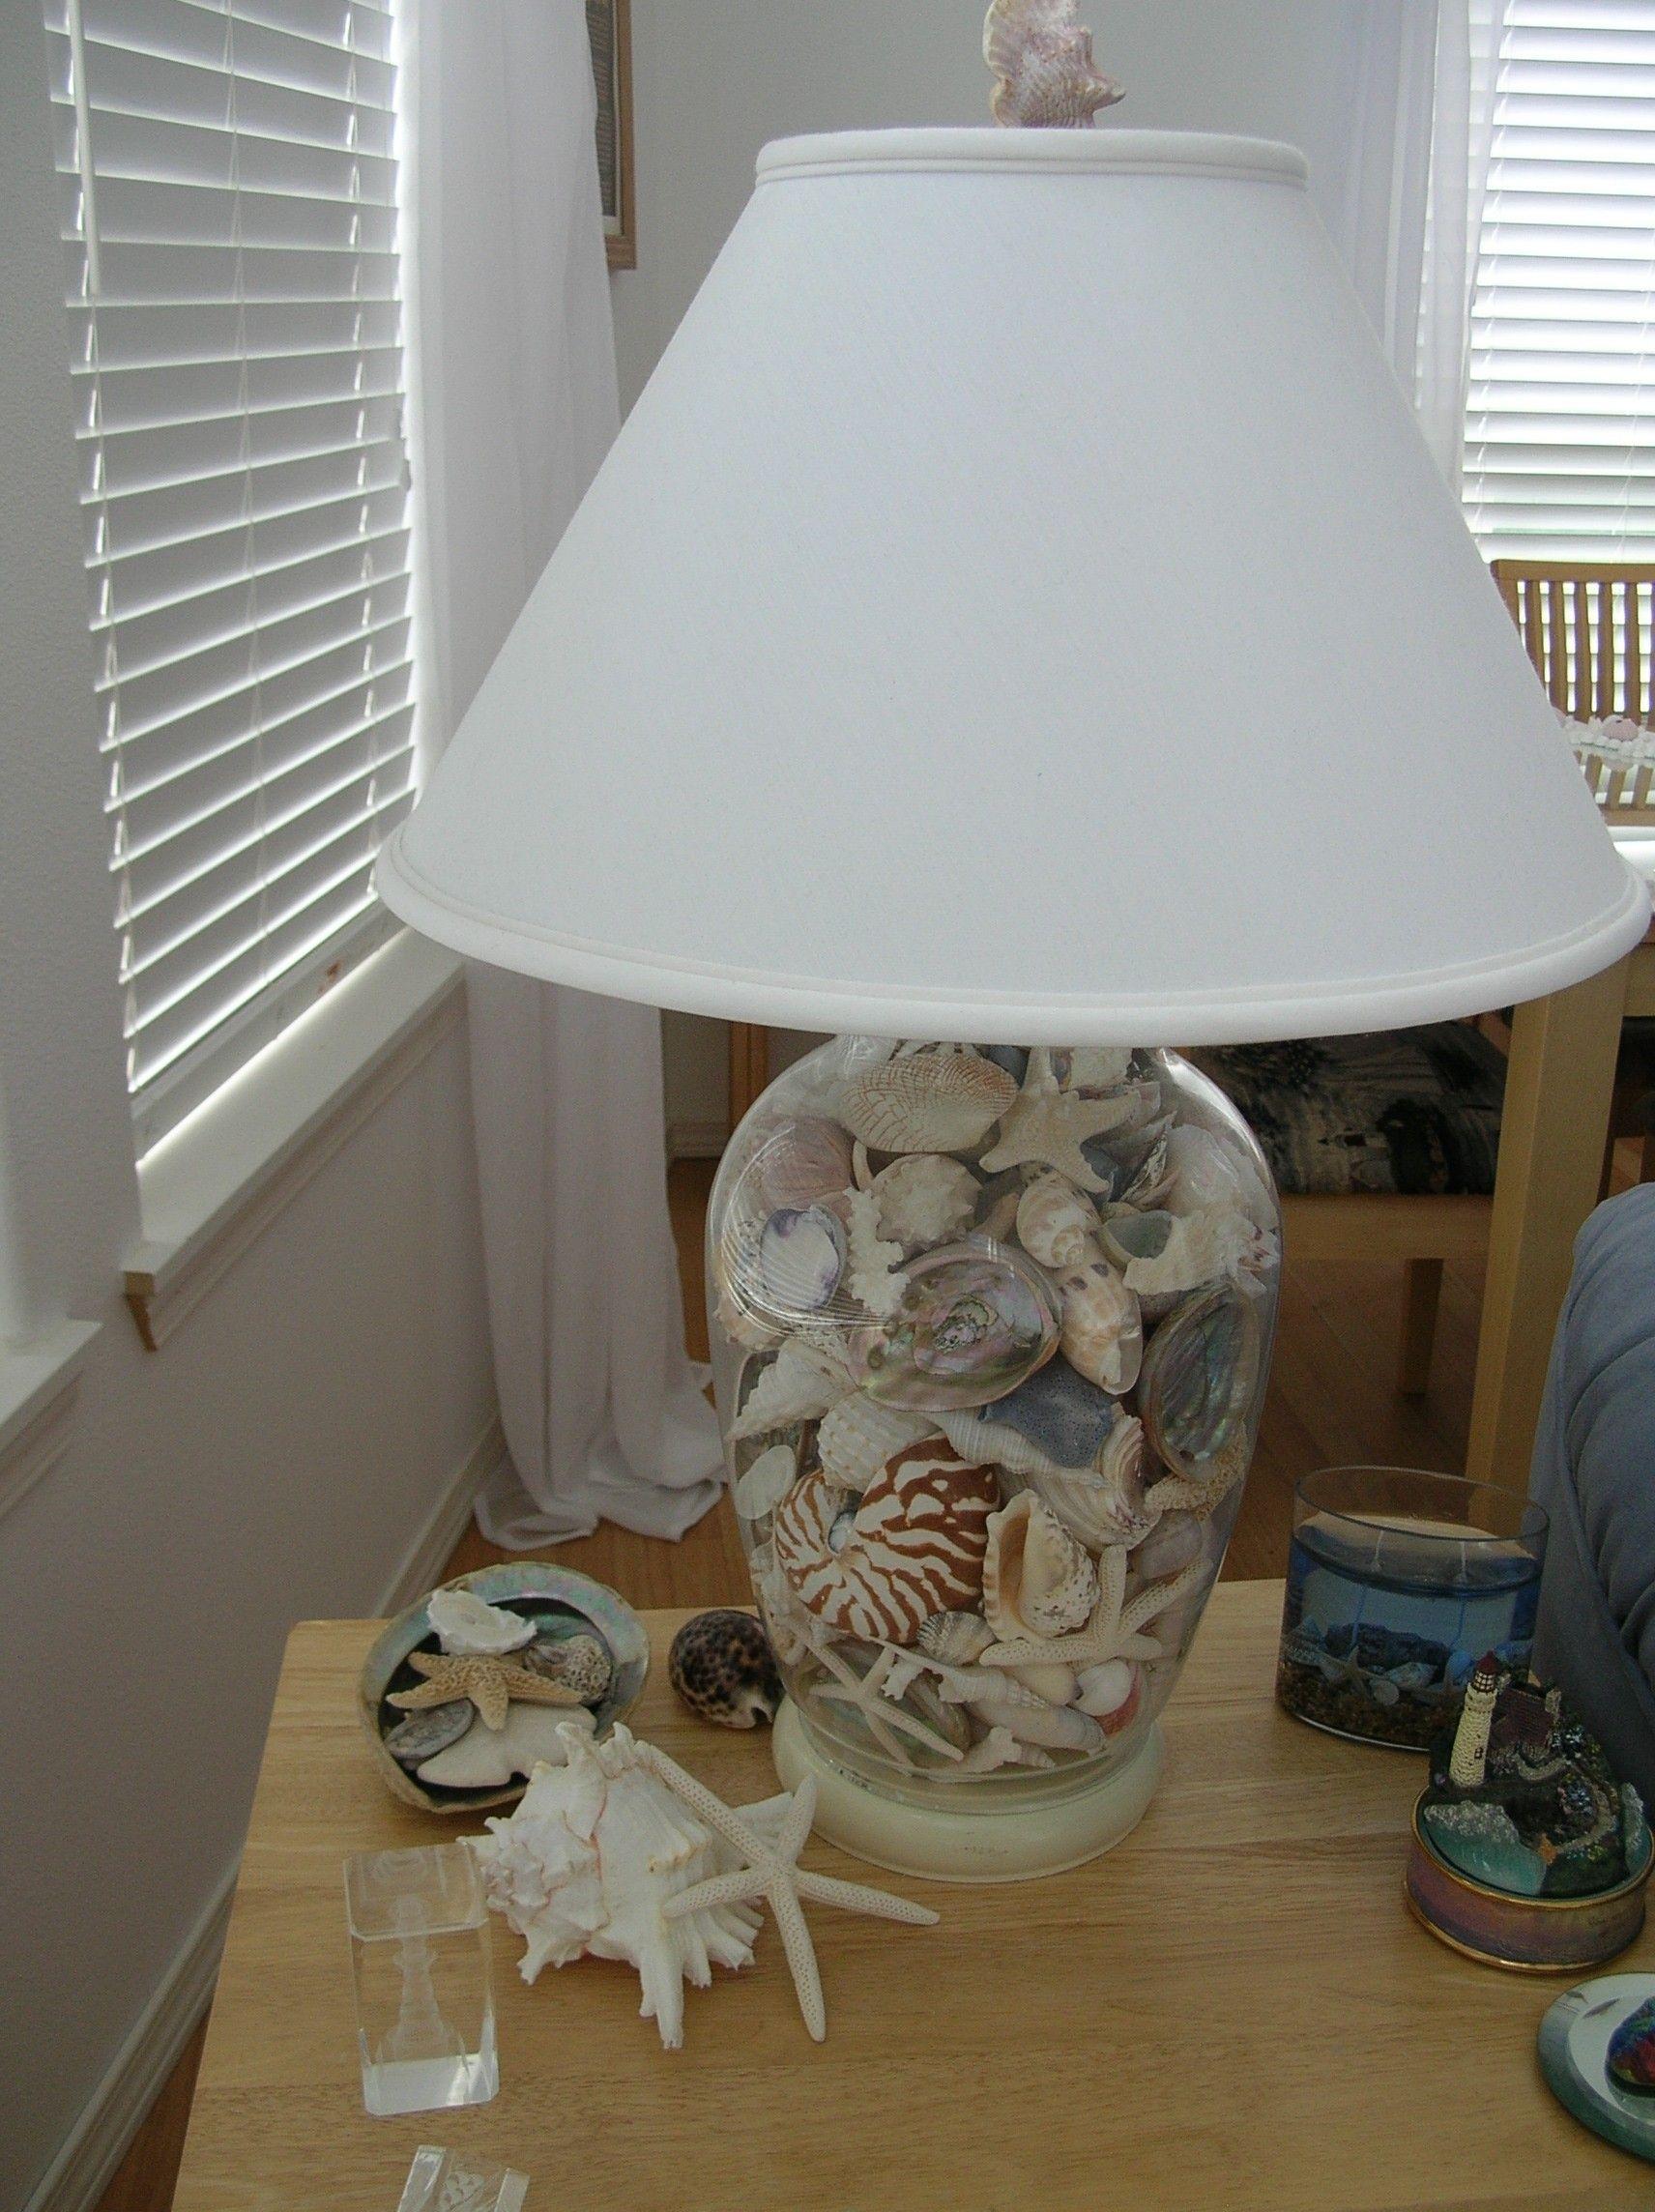 Craft ideas jennifer shouse pinterest for Shouse ideas